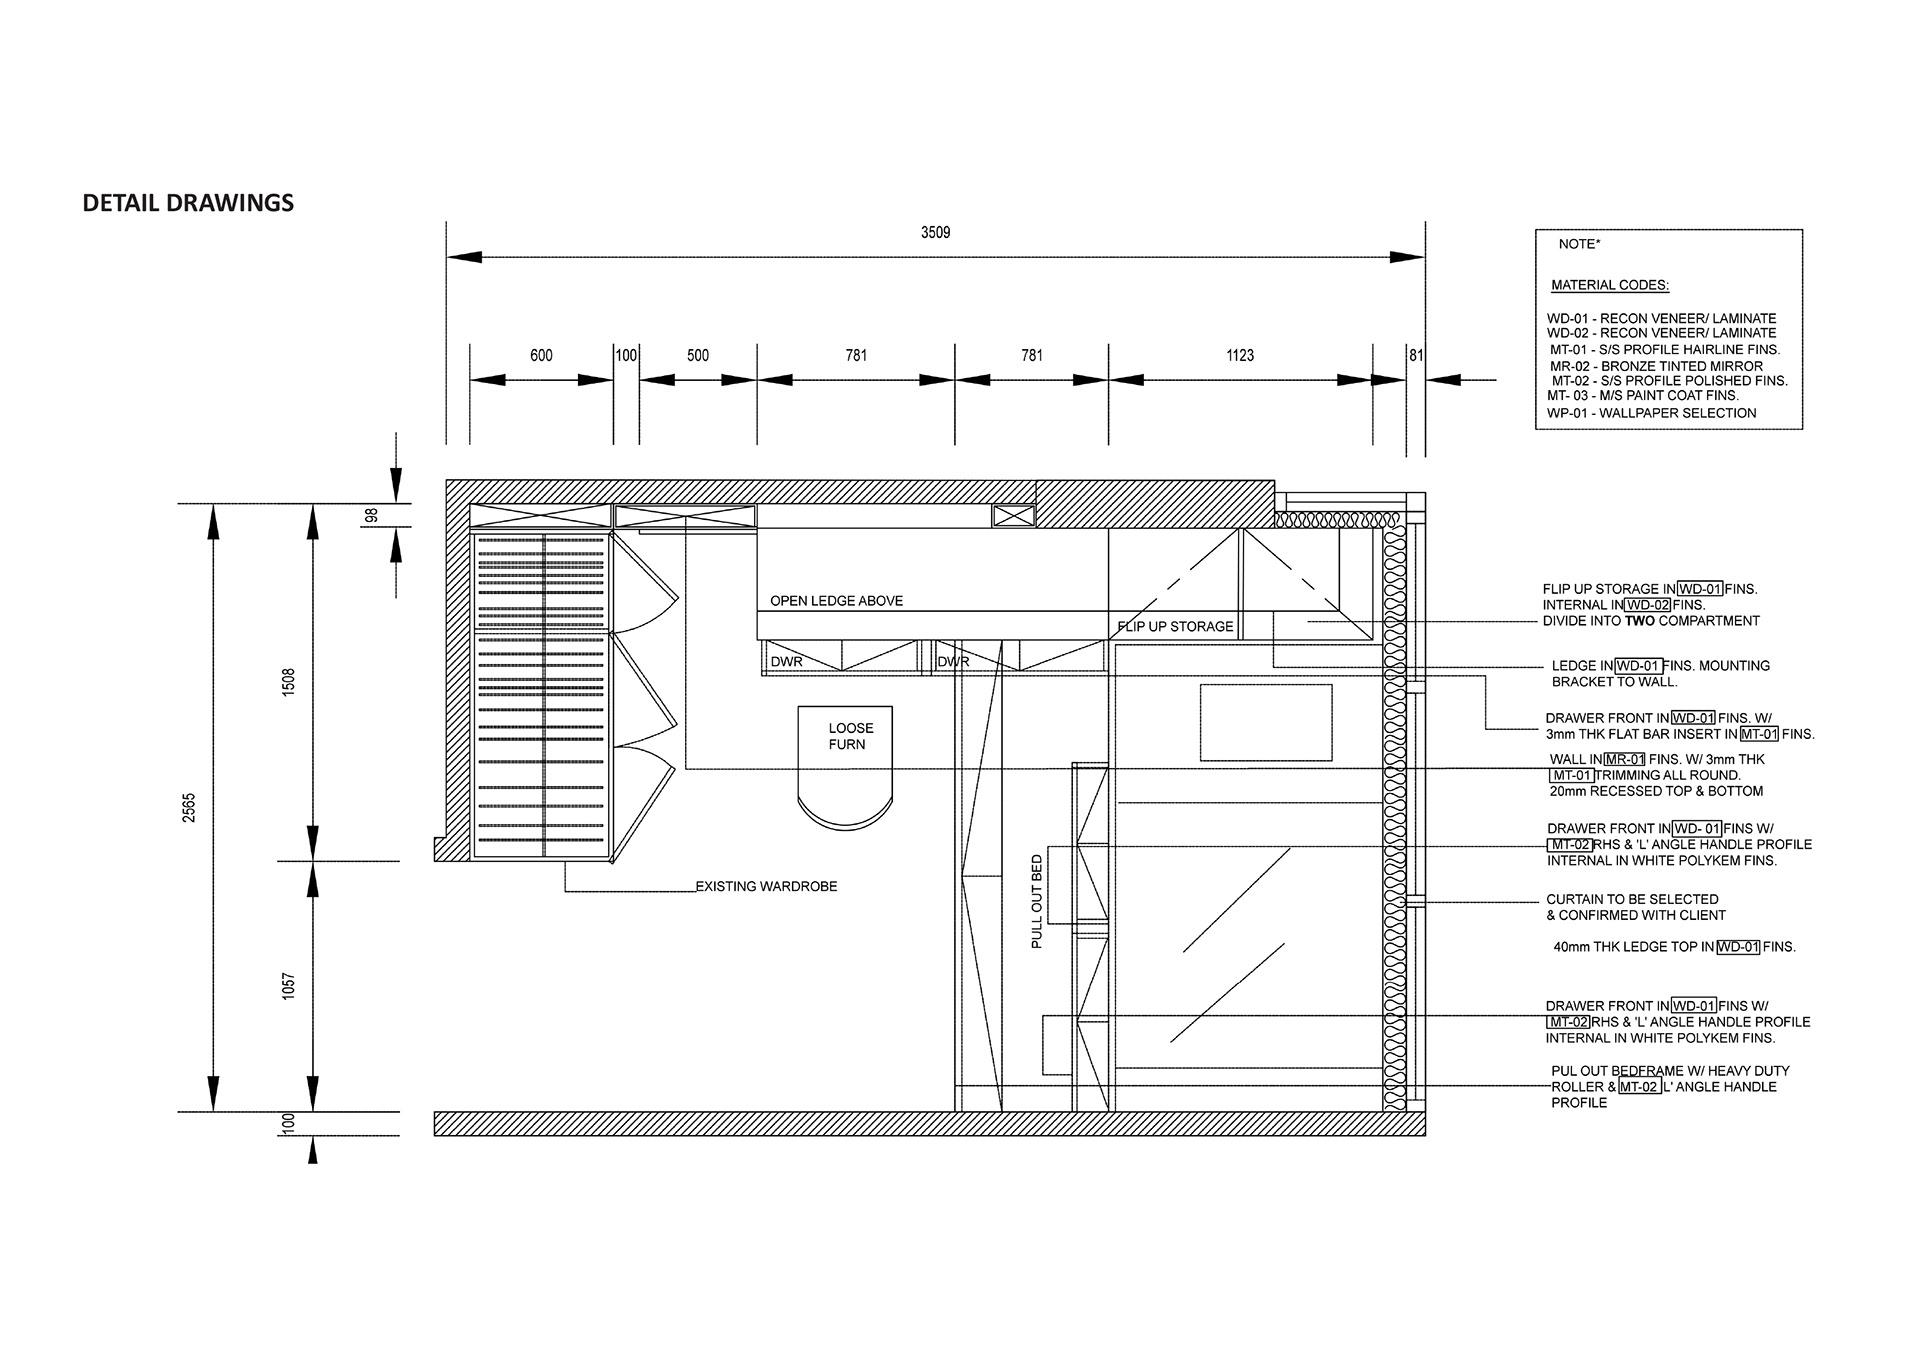 rahul chugh detail drawings